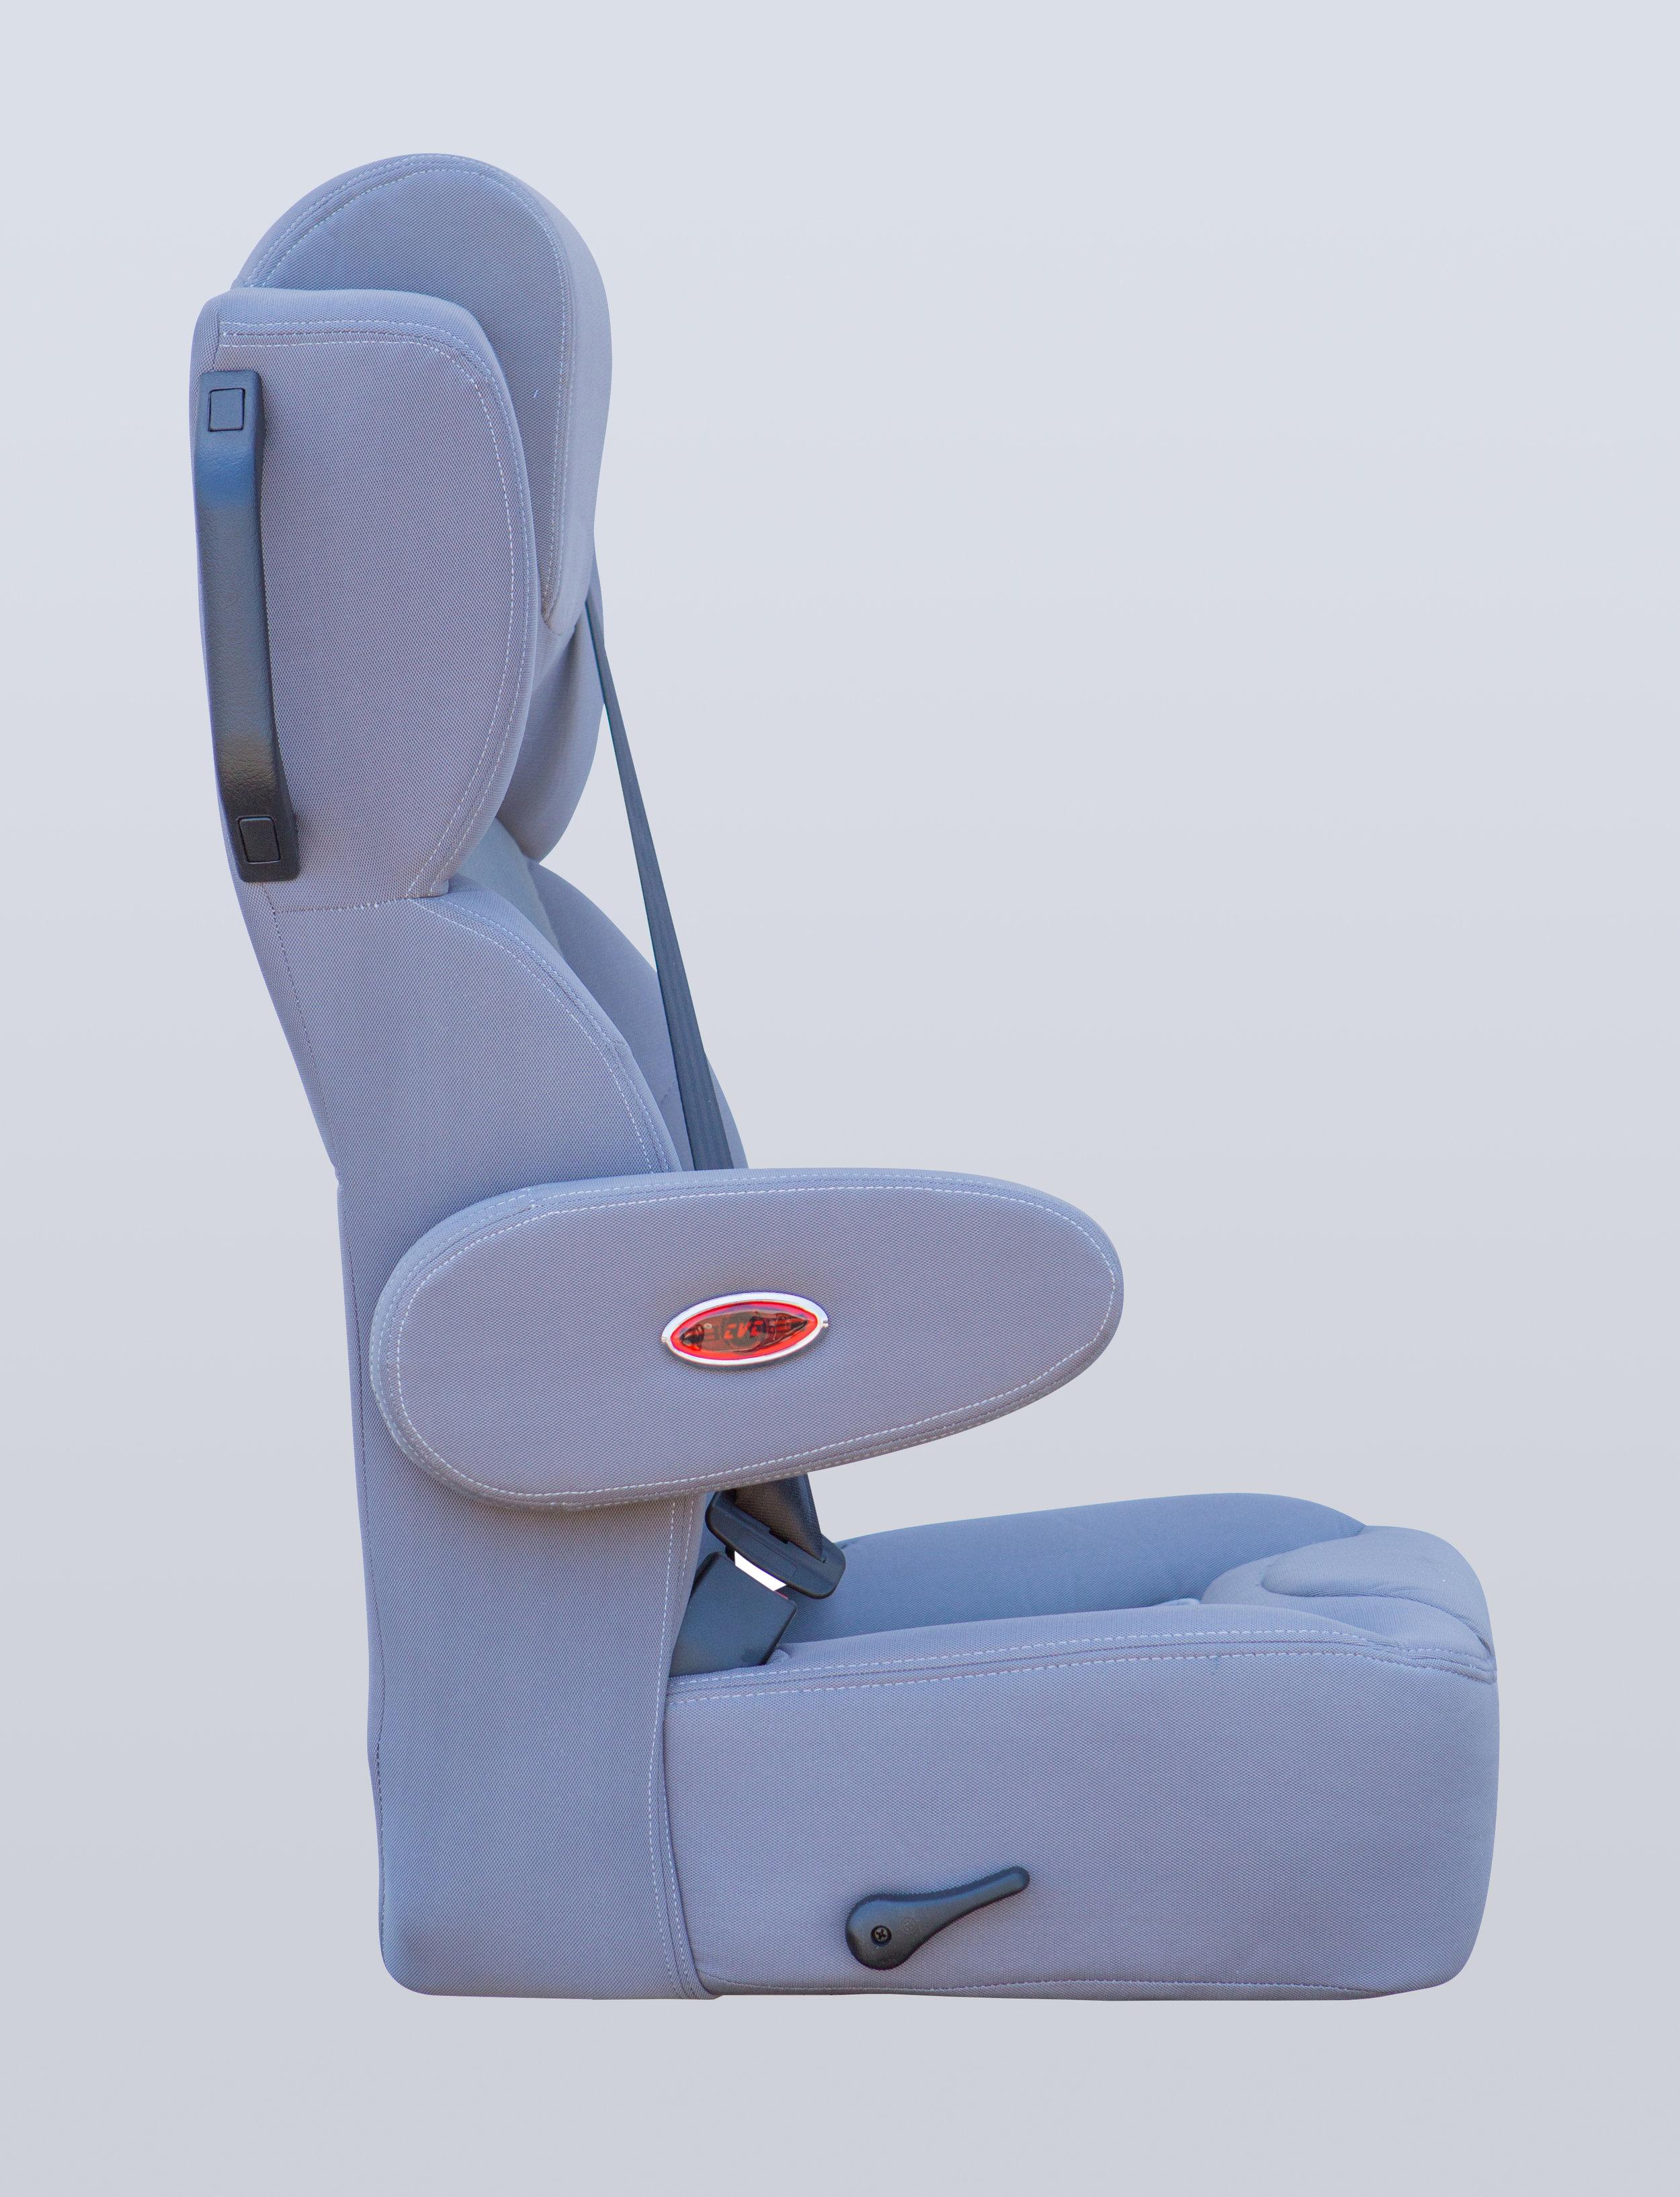 commuter seat